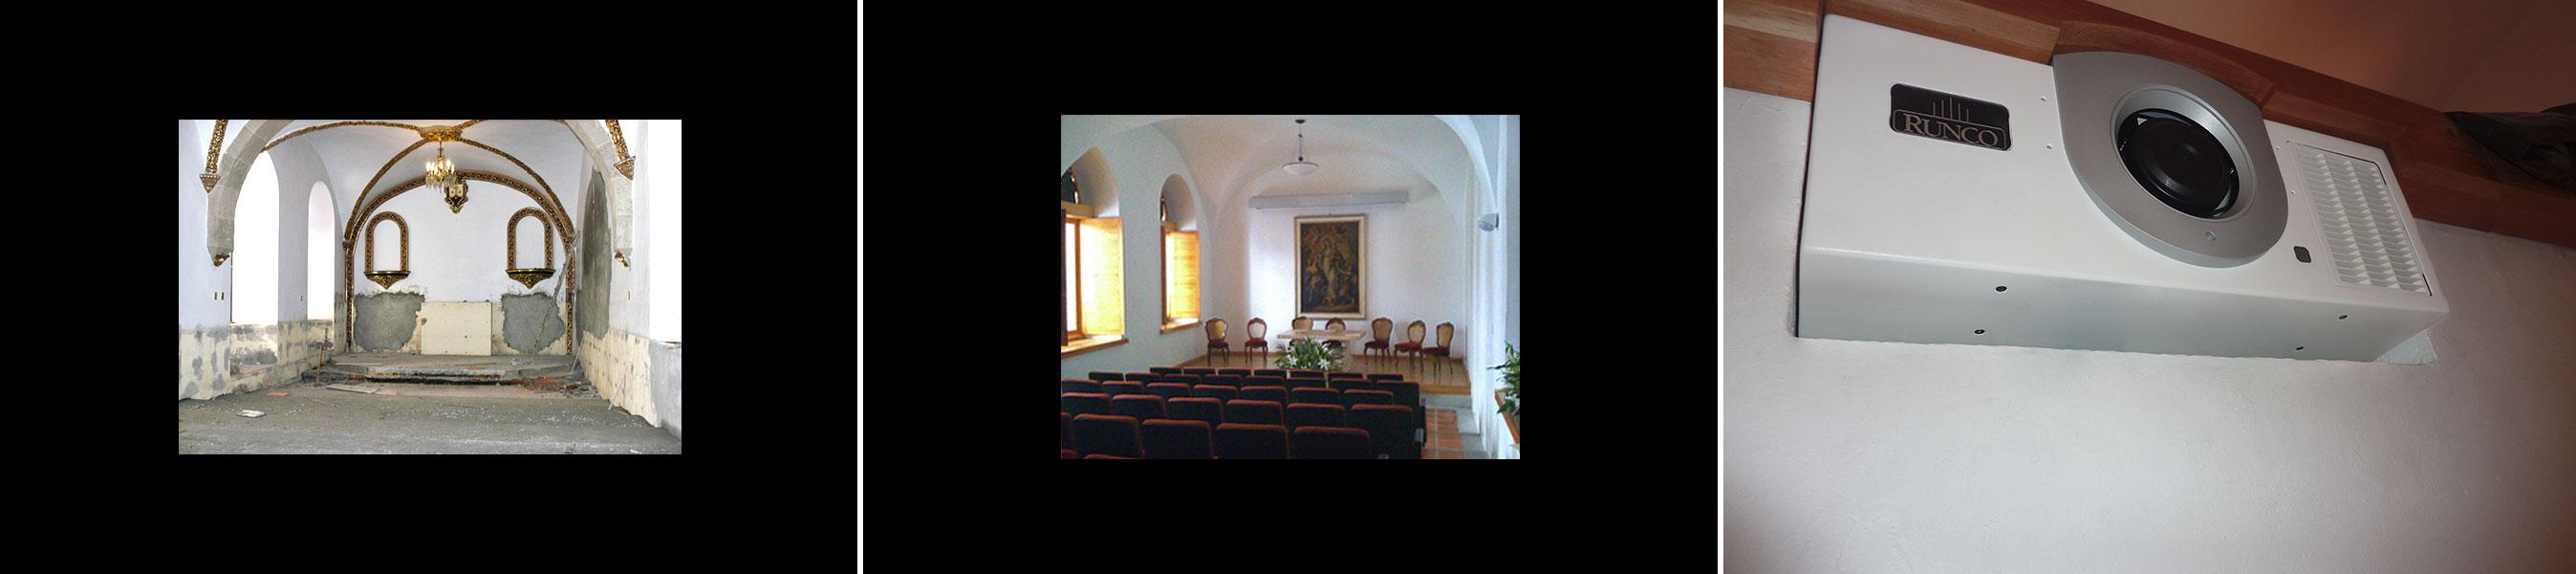 2009 – Auditorio Templo del Carmen Toluca